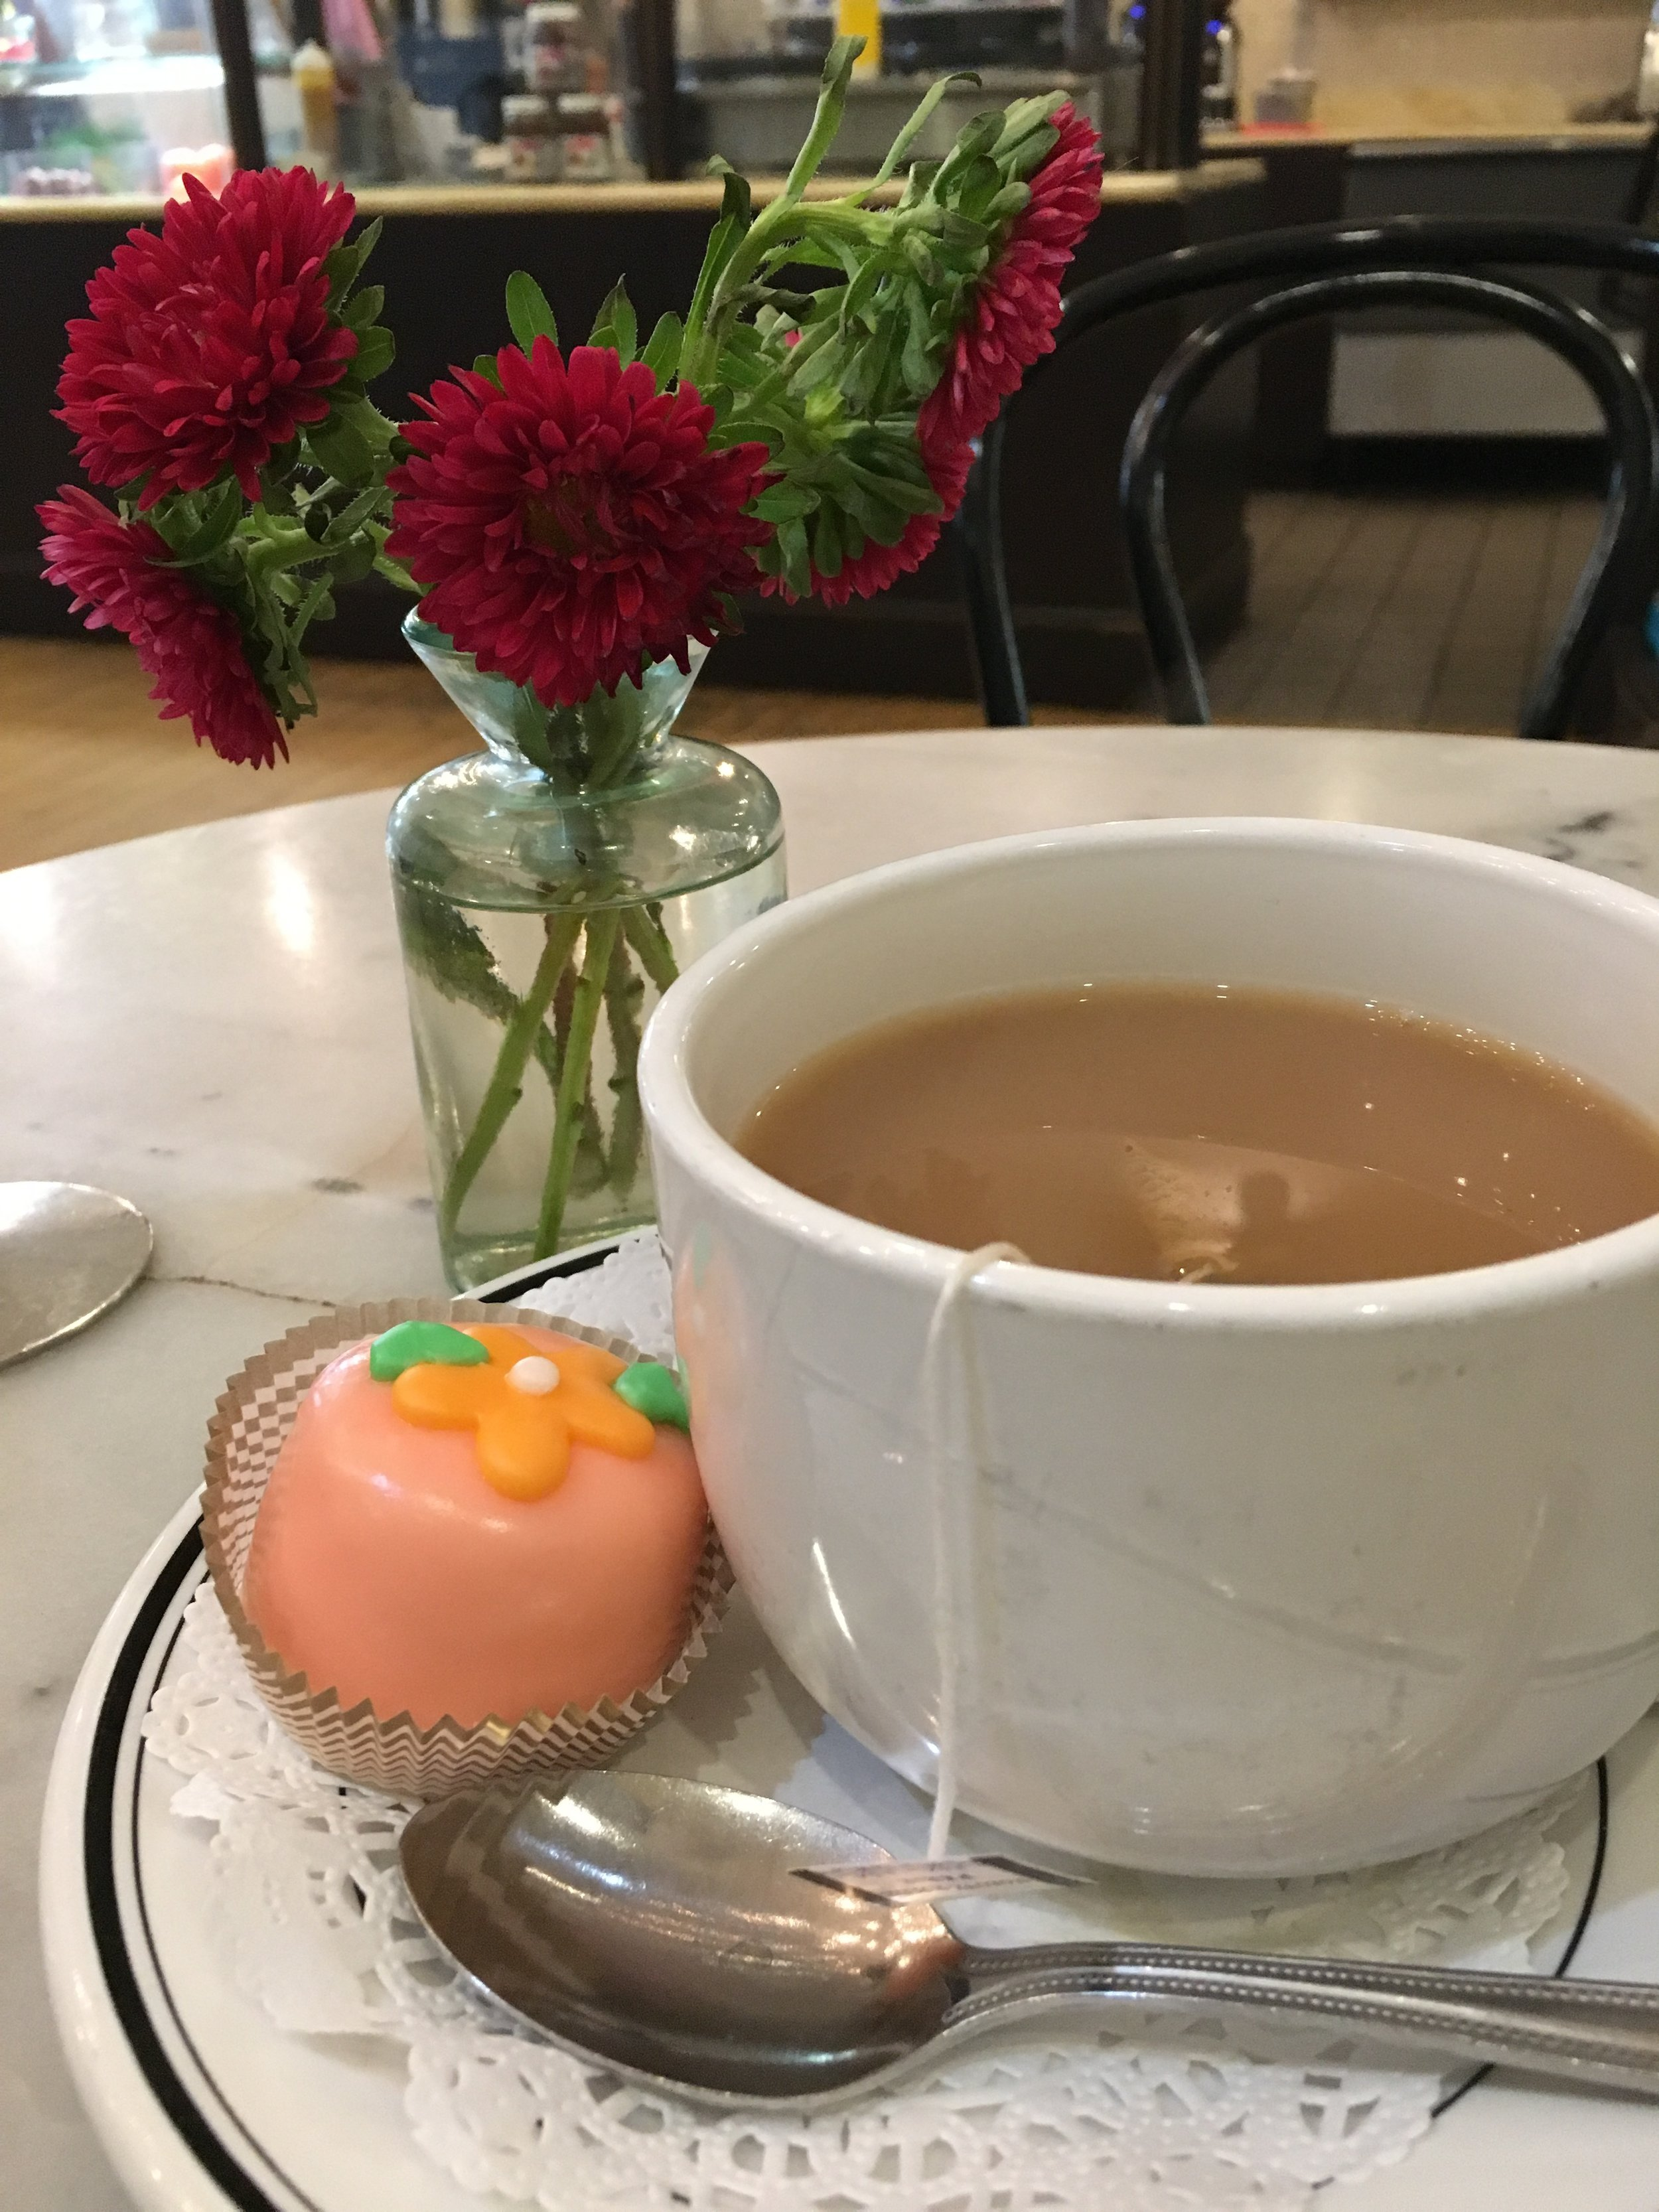 Petite Fours and Paris Tea at Toni